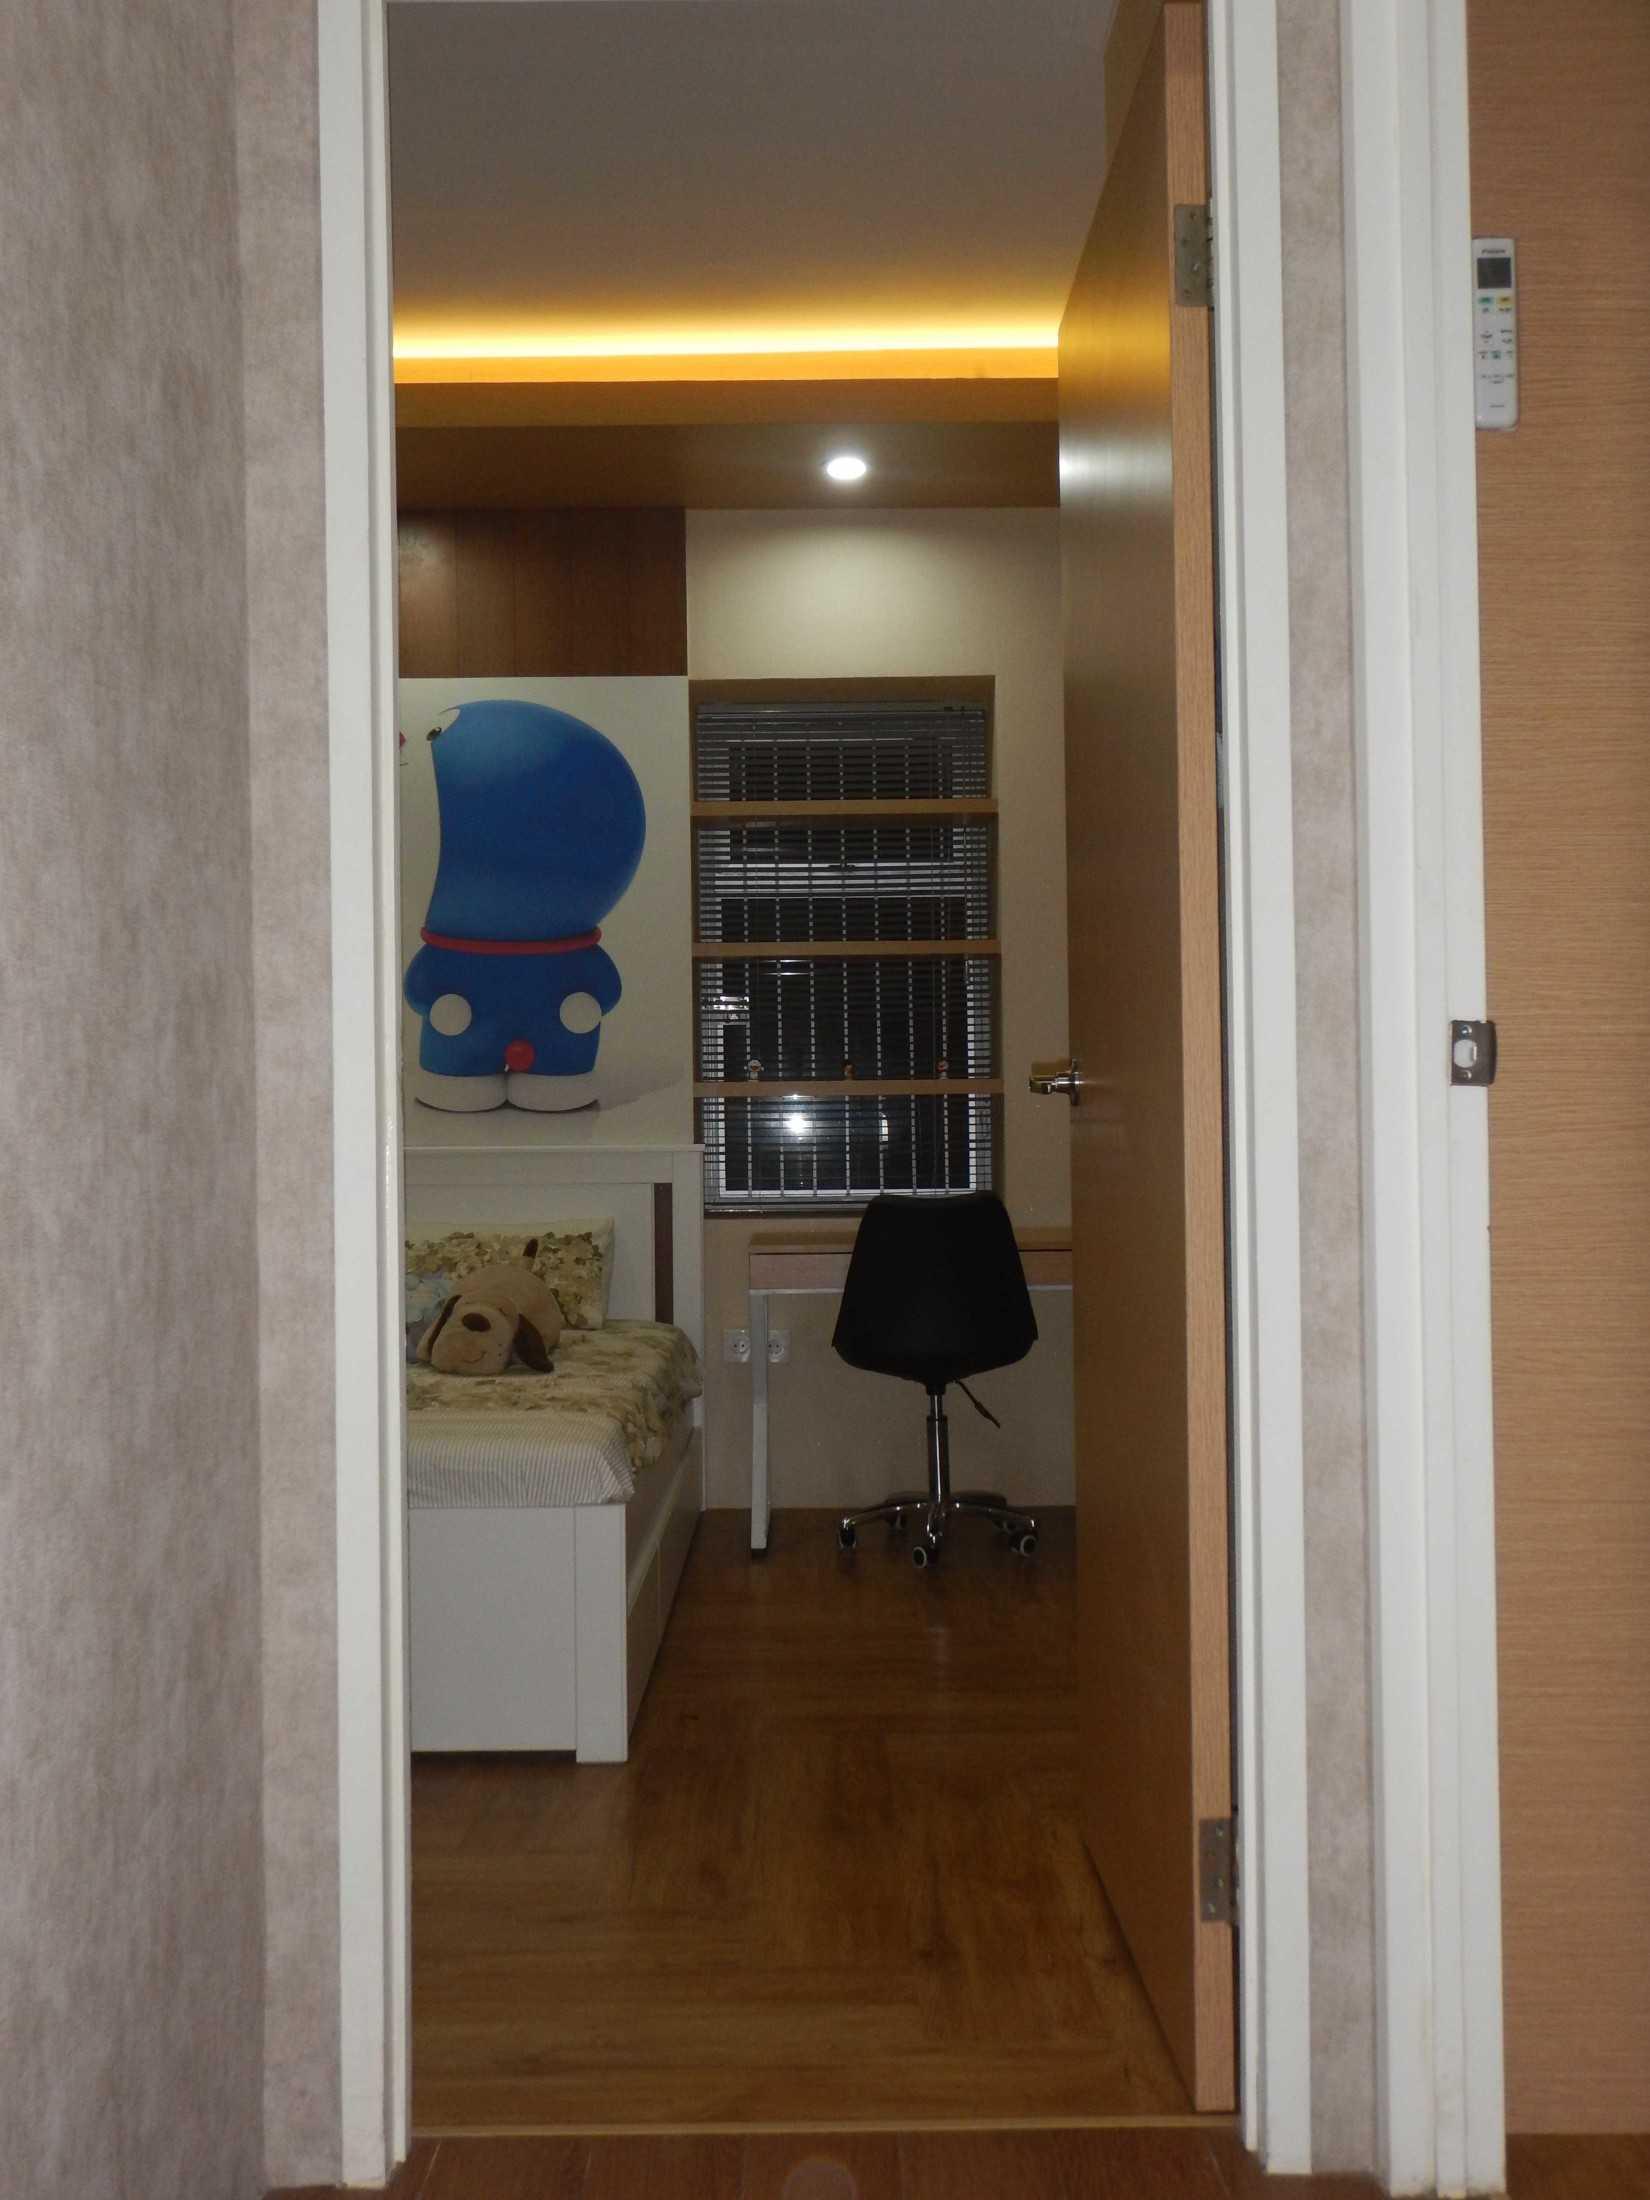 Rinto Katili Apartment F , Tower Kenanga, Mediterania, Jakarta Barat 15, Rt.5/rw.5, Tj. Duren Sel., Grogol Petamburan, Kota Jakarta Barat, Daerah Khusus Ibukota Jakarta 11470, Indonesia 15, Rt.5/rw.5, Tj. Duren Sel., Grogol Petamburan, Kota Jakarta Barat, Daerah Khusus Ibukota Jakarta 11470, Indonesia Rinto-Katili-Apartment-F-Tower-Kenanga-Mediterania-Jakarta-Barat  67598